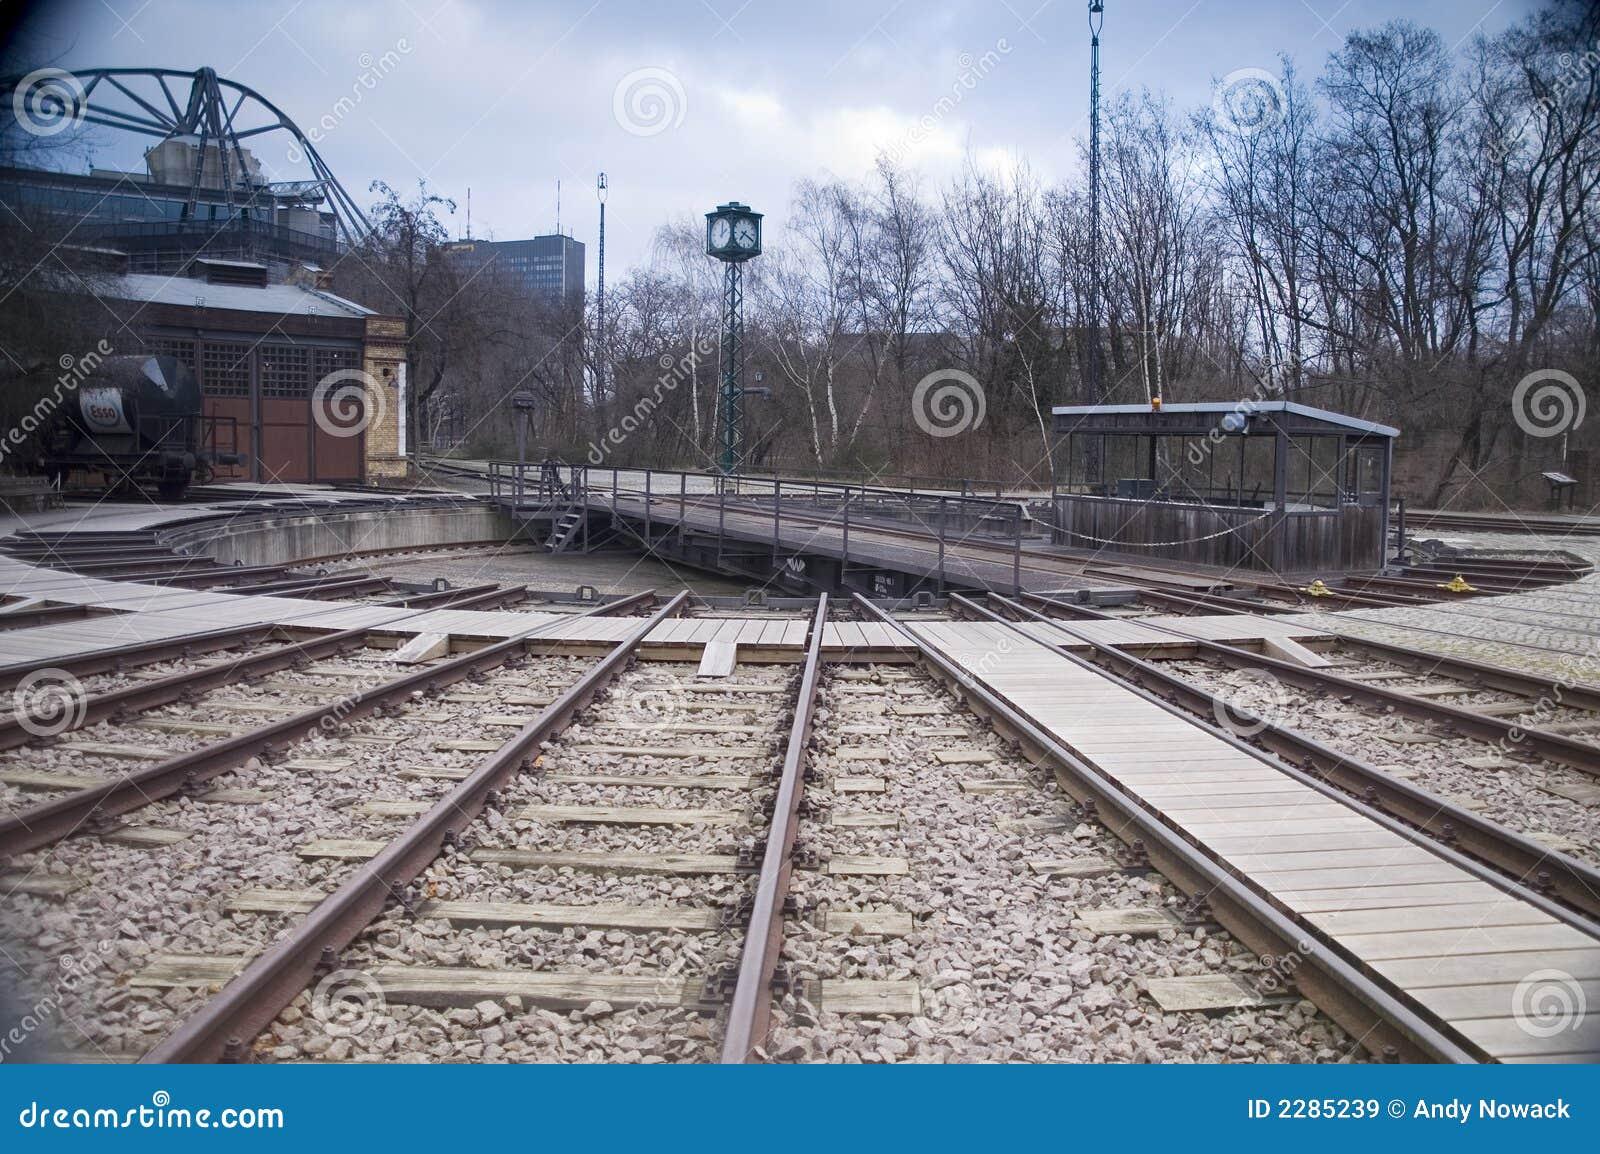 Railroad Track Turntable stock image  Image of locomotive